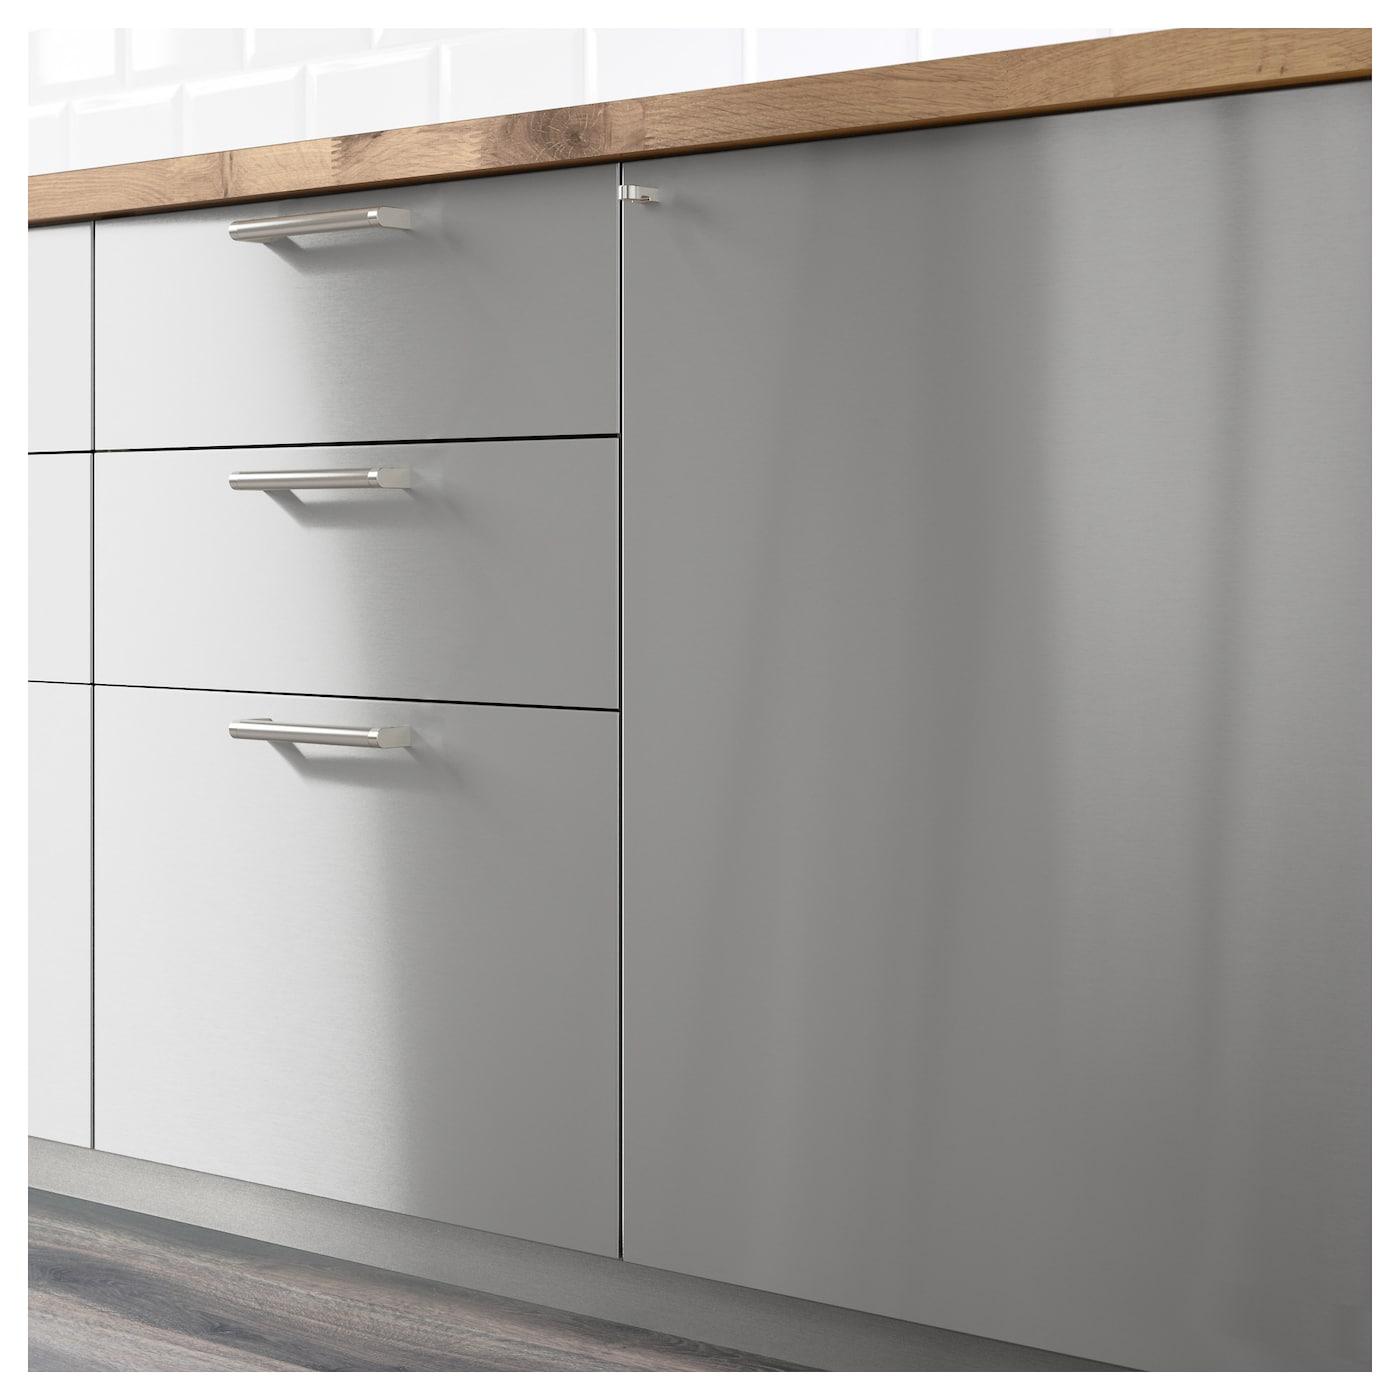 Stainless Steel Kitchen Cabinet Penang: GREVSTA Door Stainless Steel 60x80 Cm